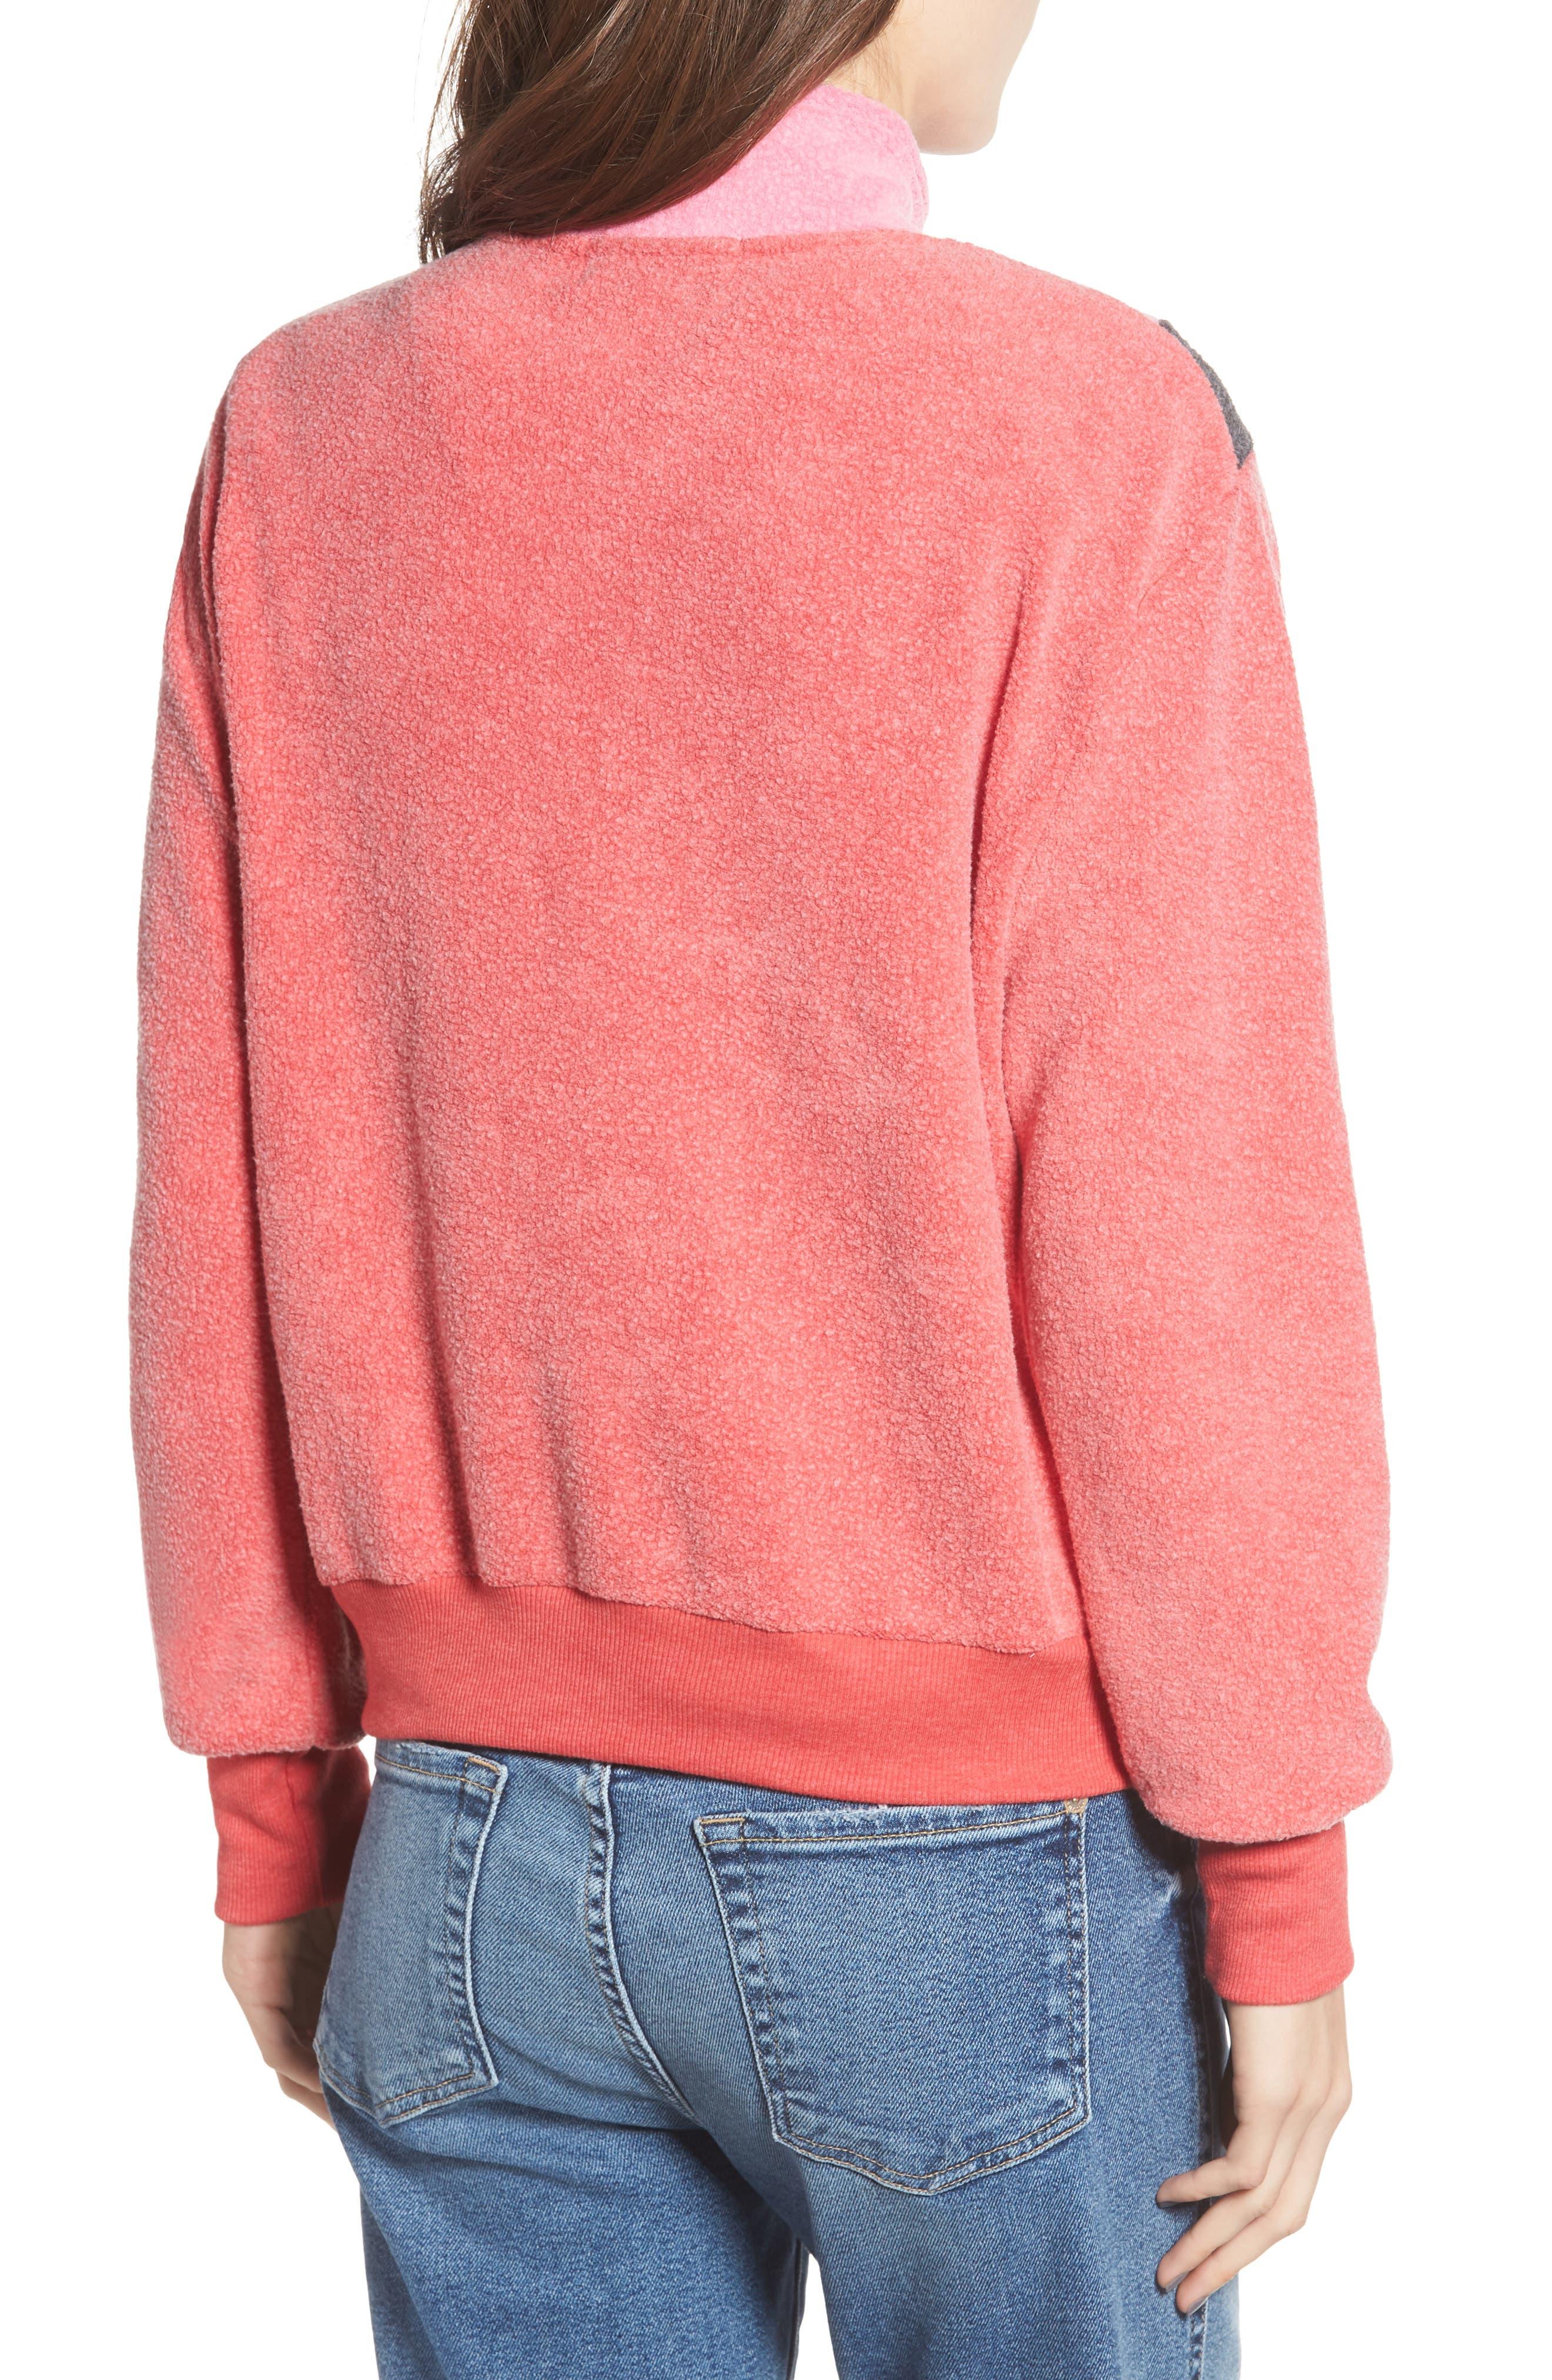 Soto Warm-Up Sweatshirt,                             Alternate thumbnail 2, color,                             620